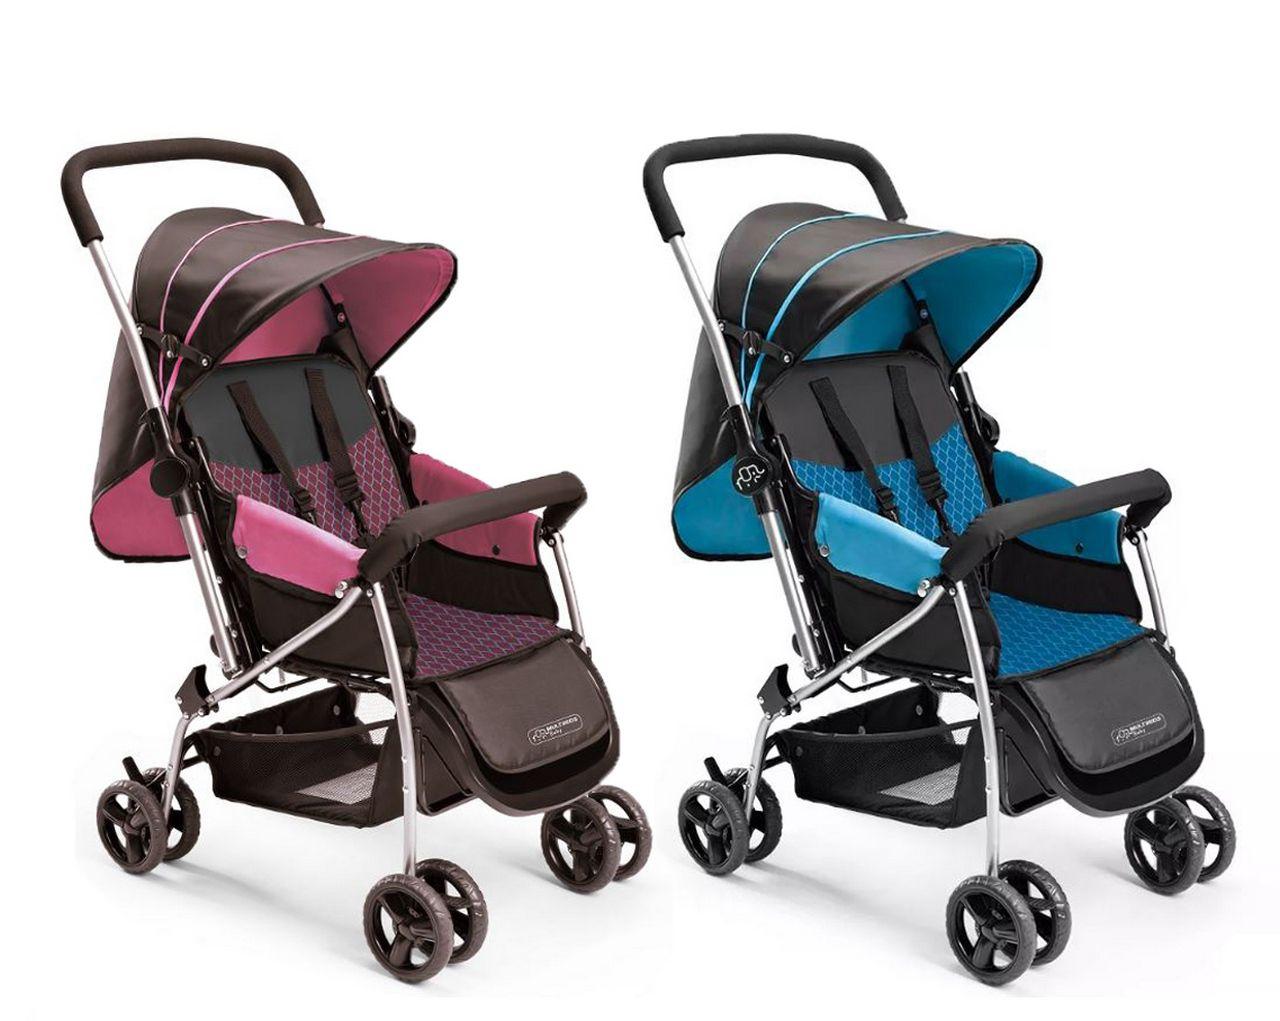 Carrinho De Bebê Berço Flip Multikids Baby Multilaser